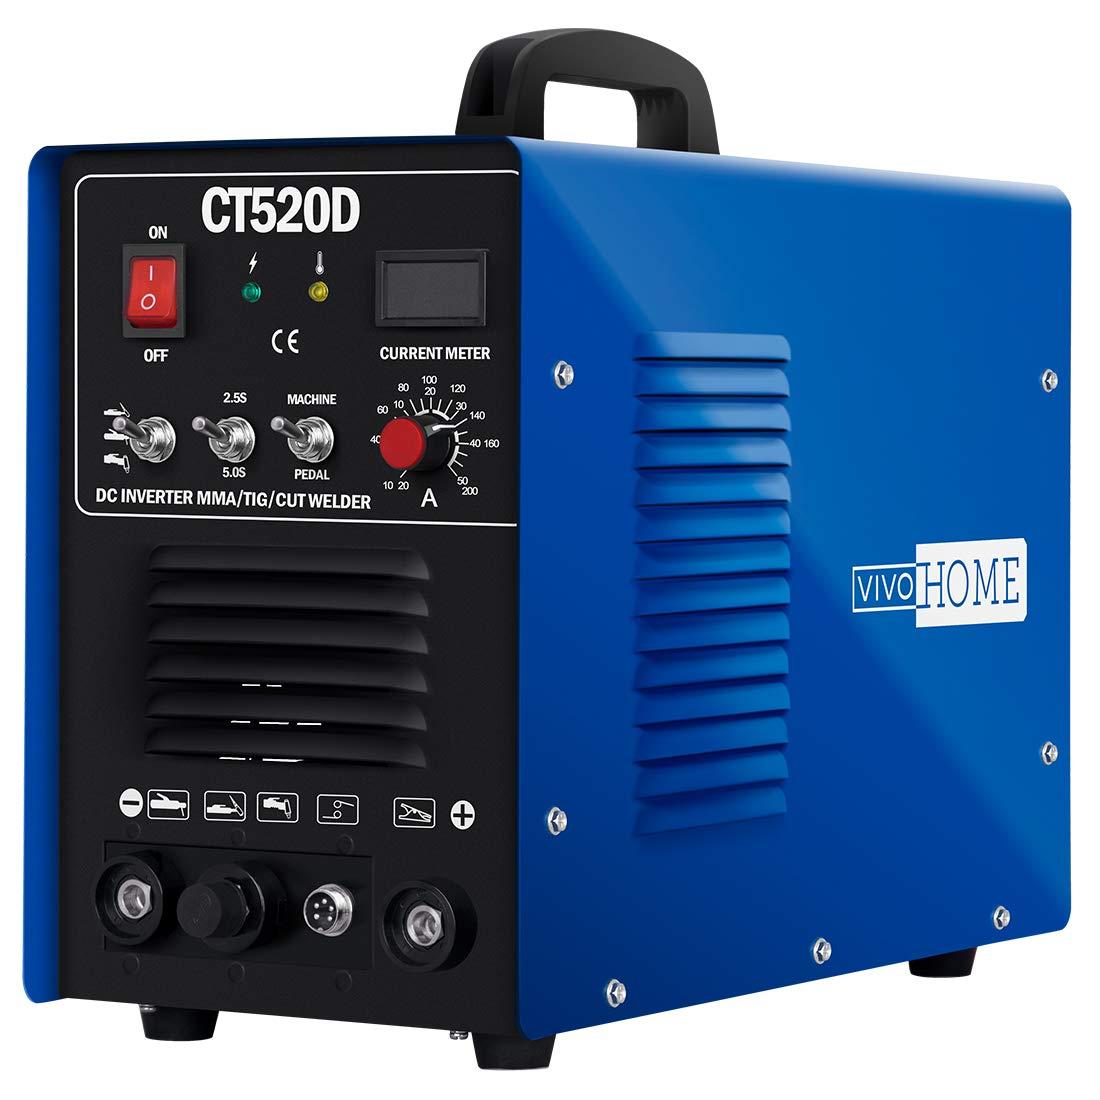 VIVOHOME 3 In 1 Multi-functional Plasma Cutter Cutting TIG STICK/MMA Welding Machine Dual Voltage 110/220V CT520D Blue